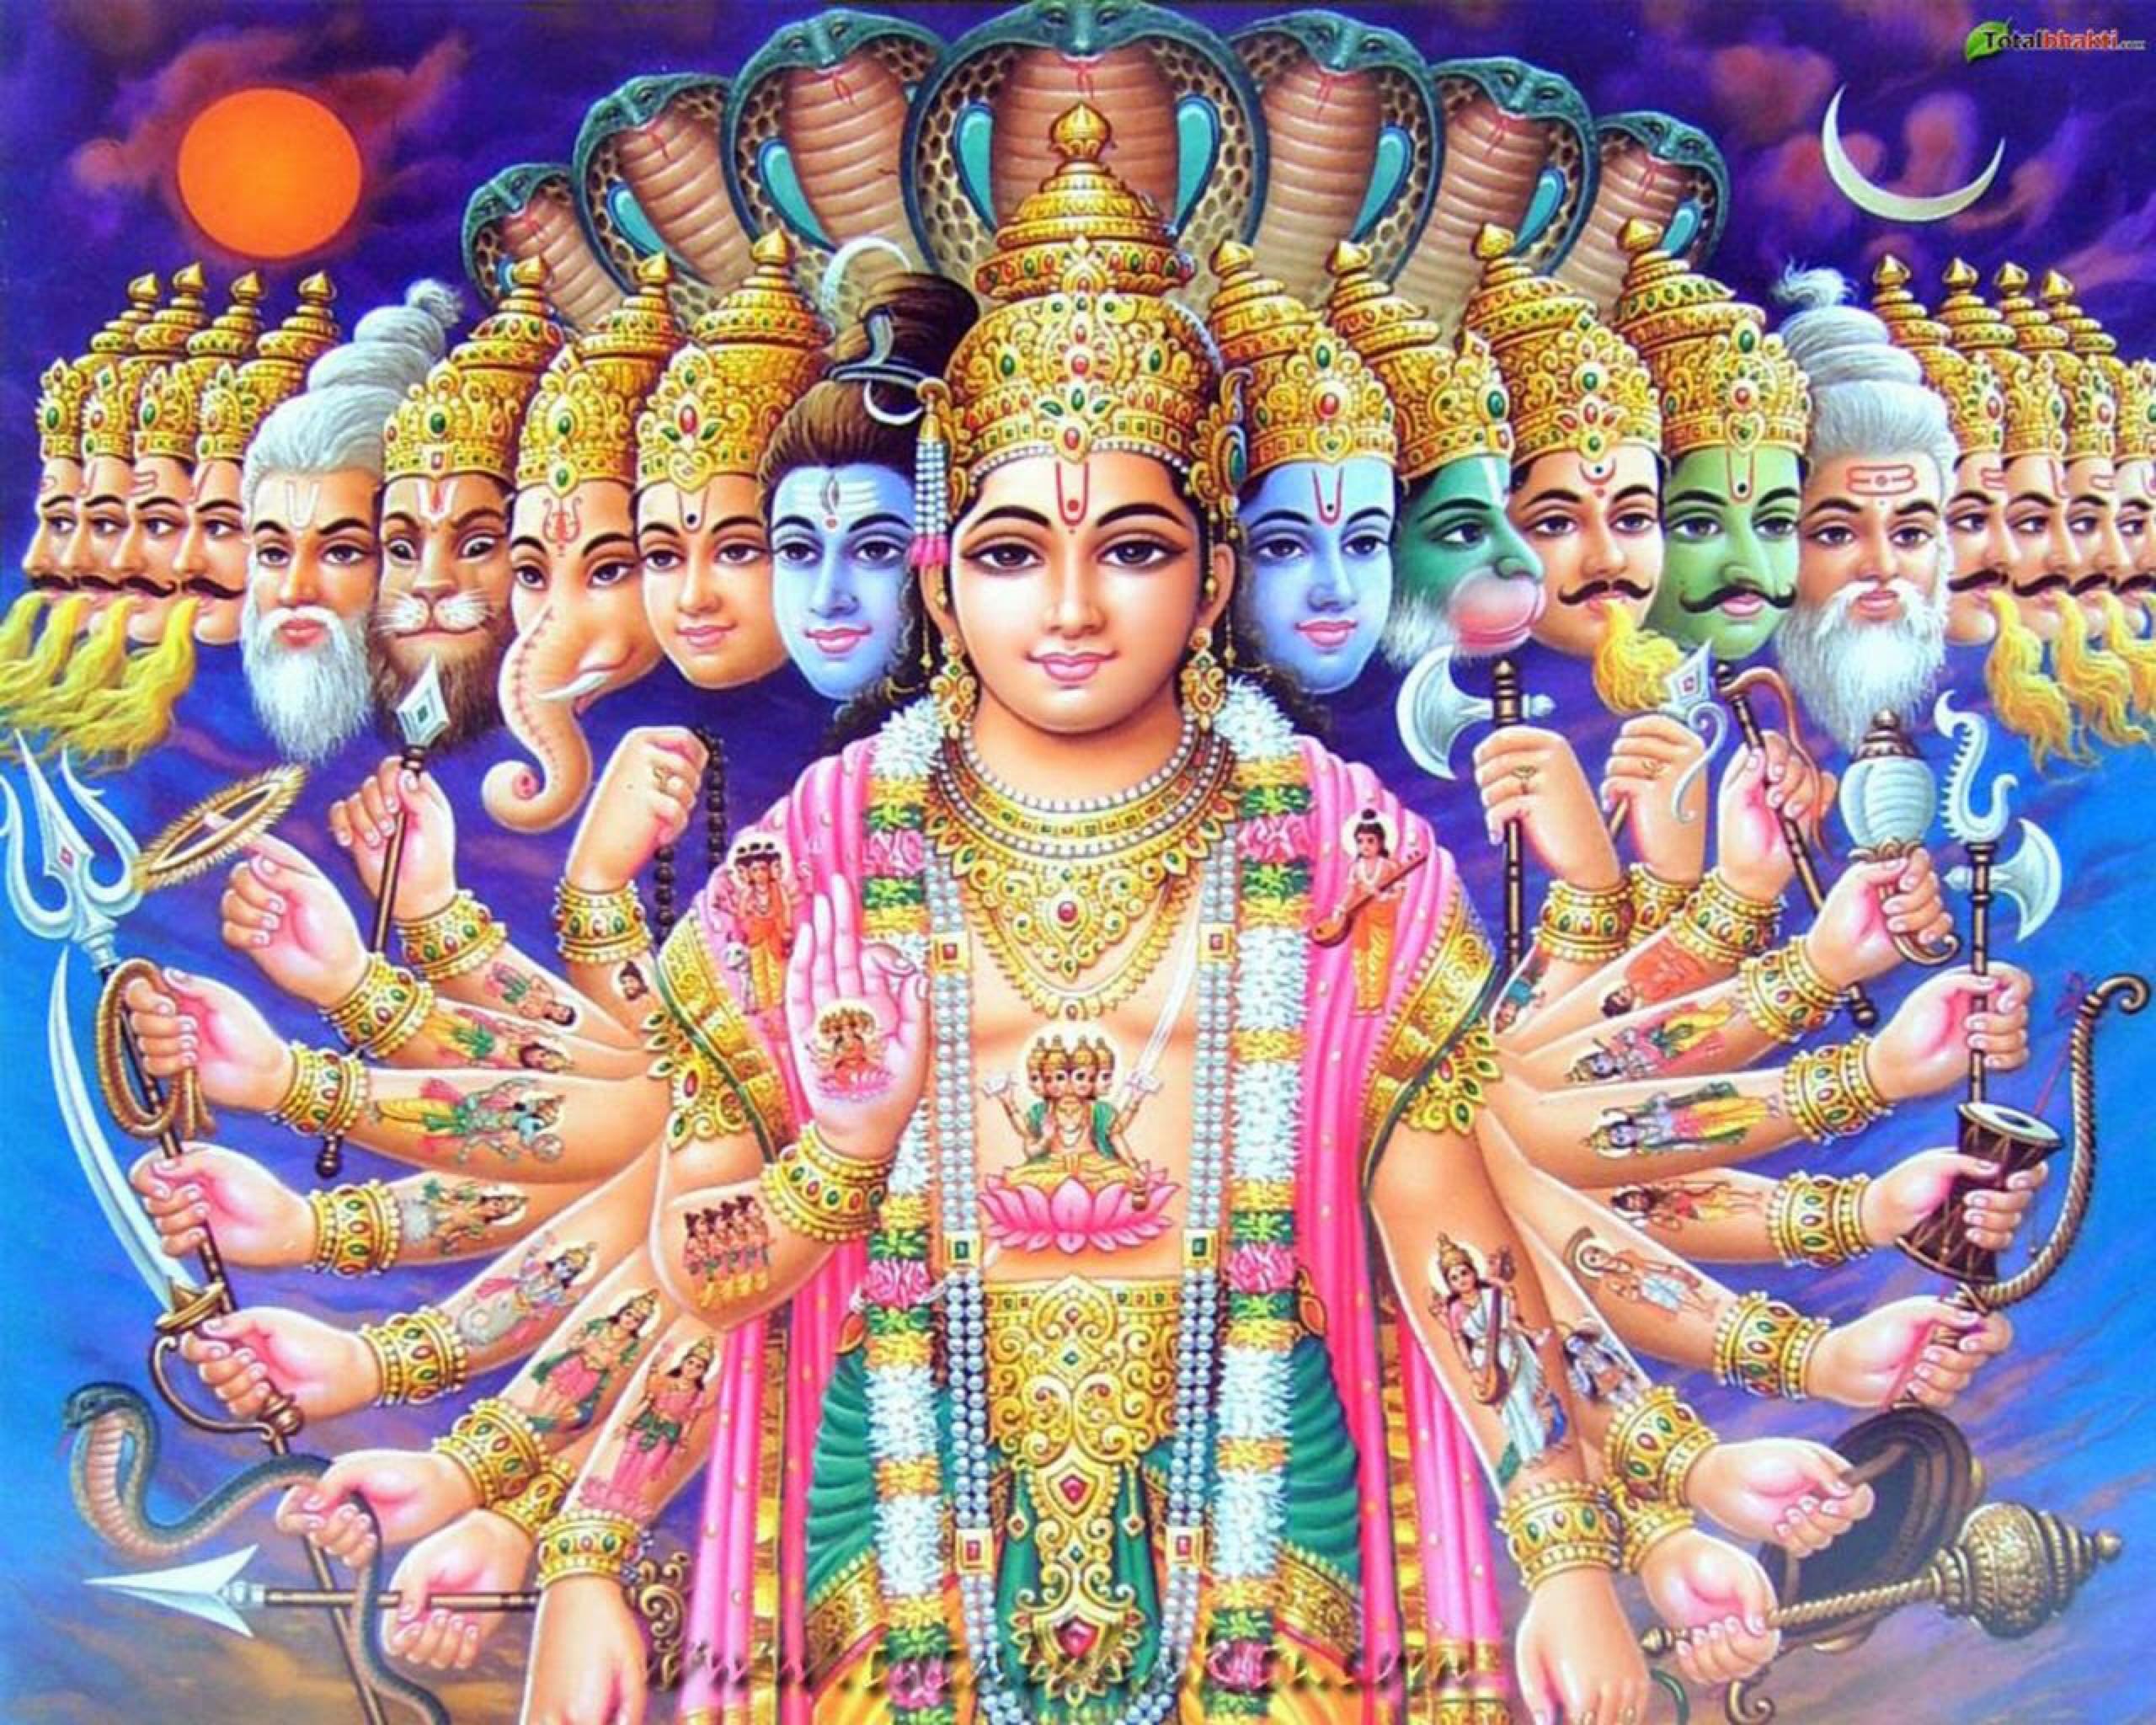 Gulshan Kumar Bhakti Songs Free Download Maa Songs Bollywood